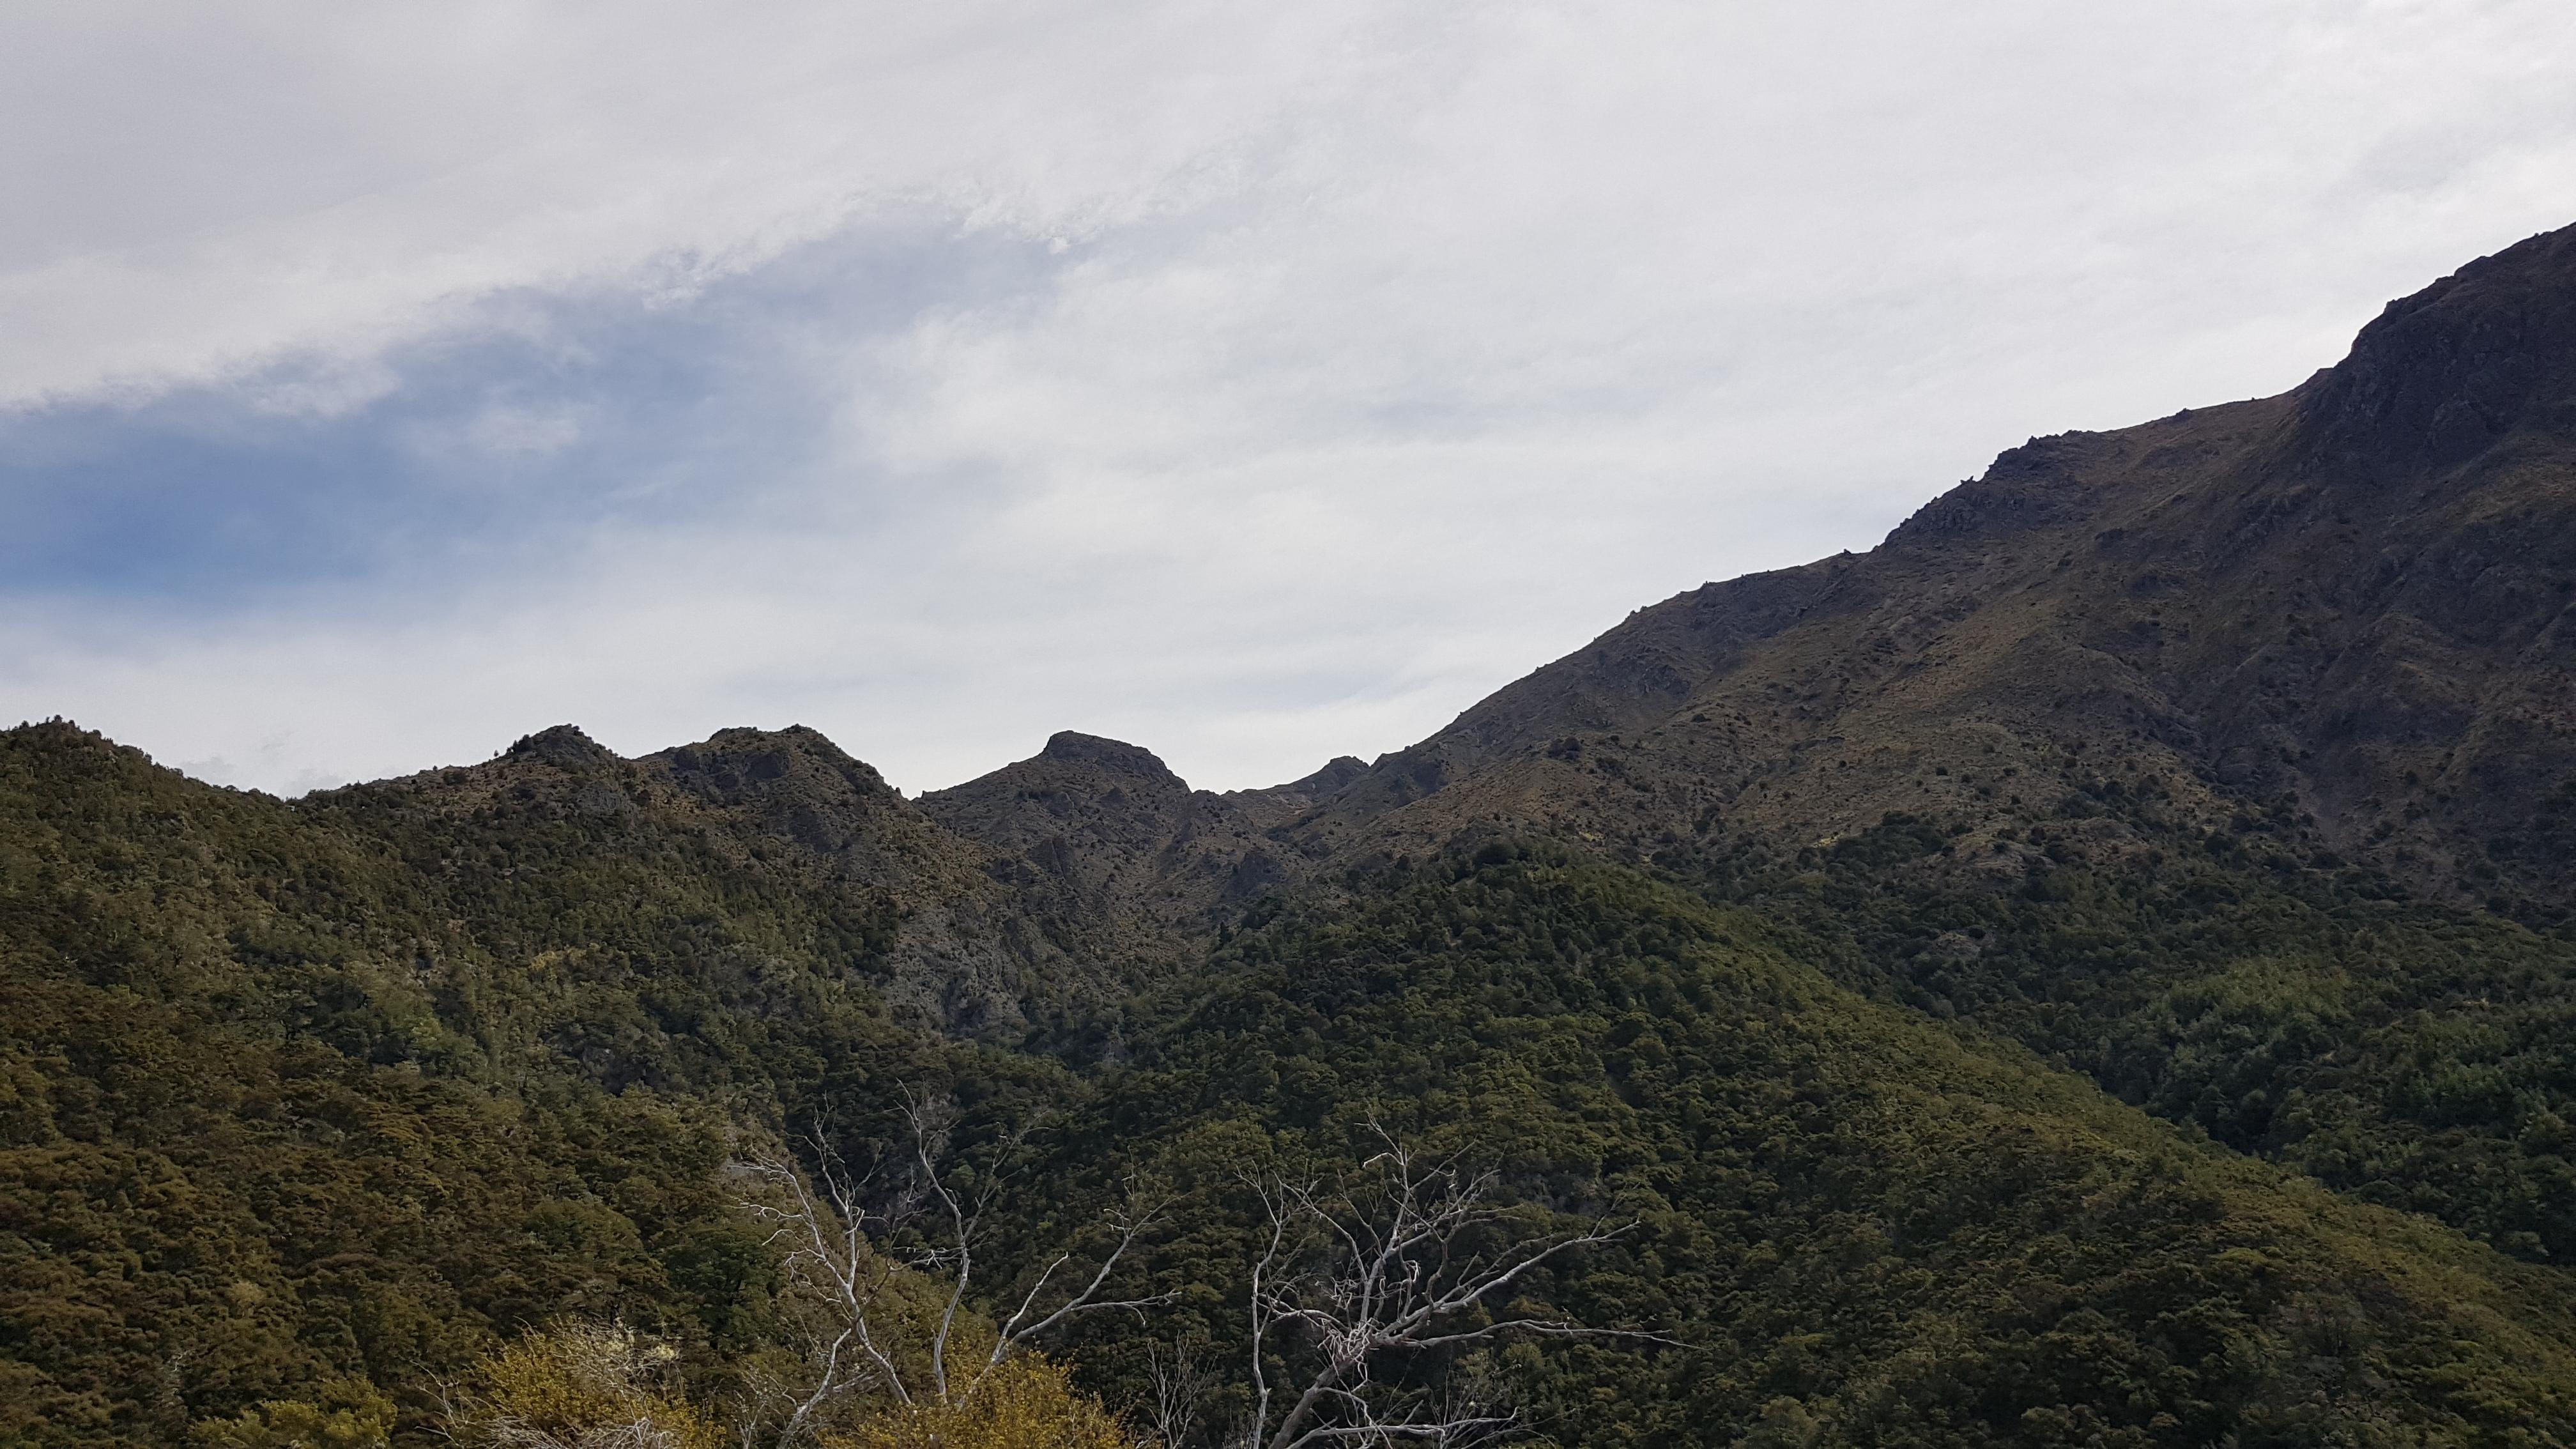 Views across to the Blairich range